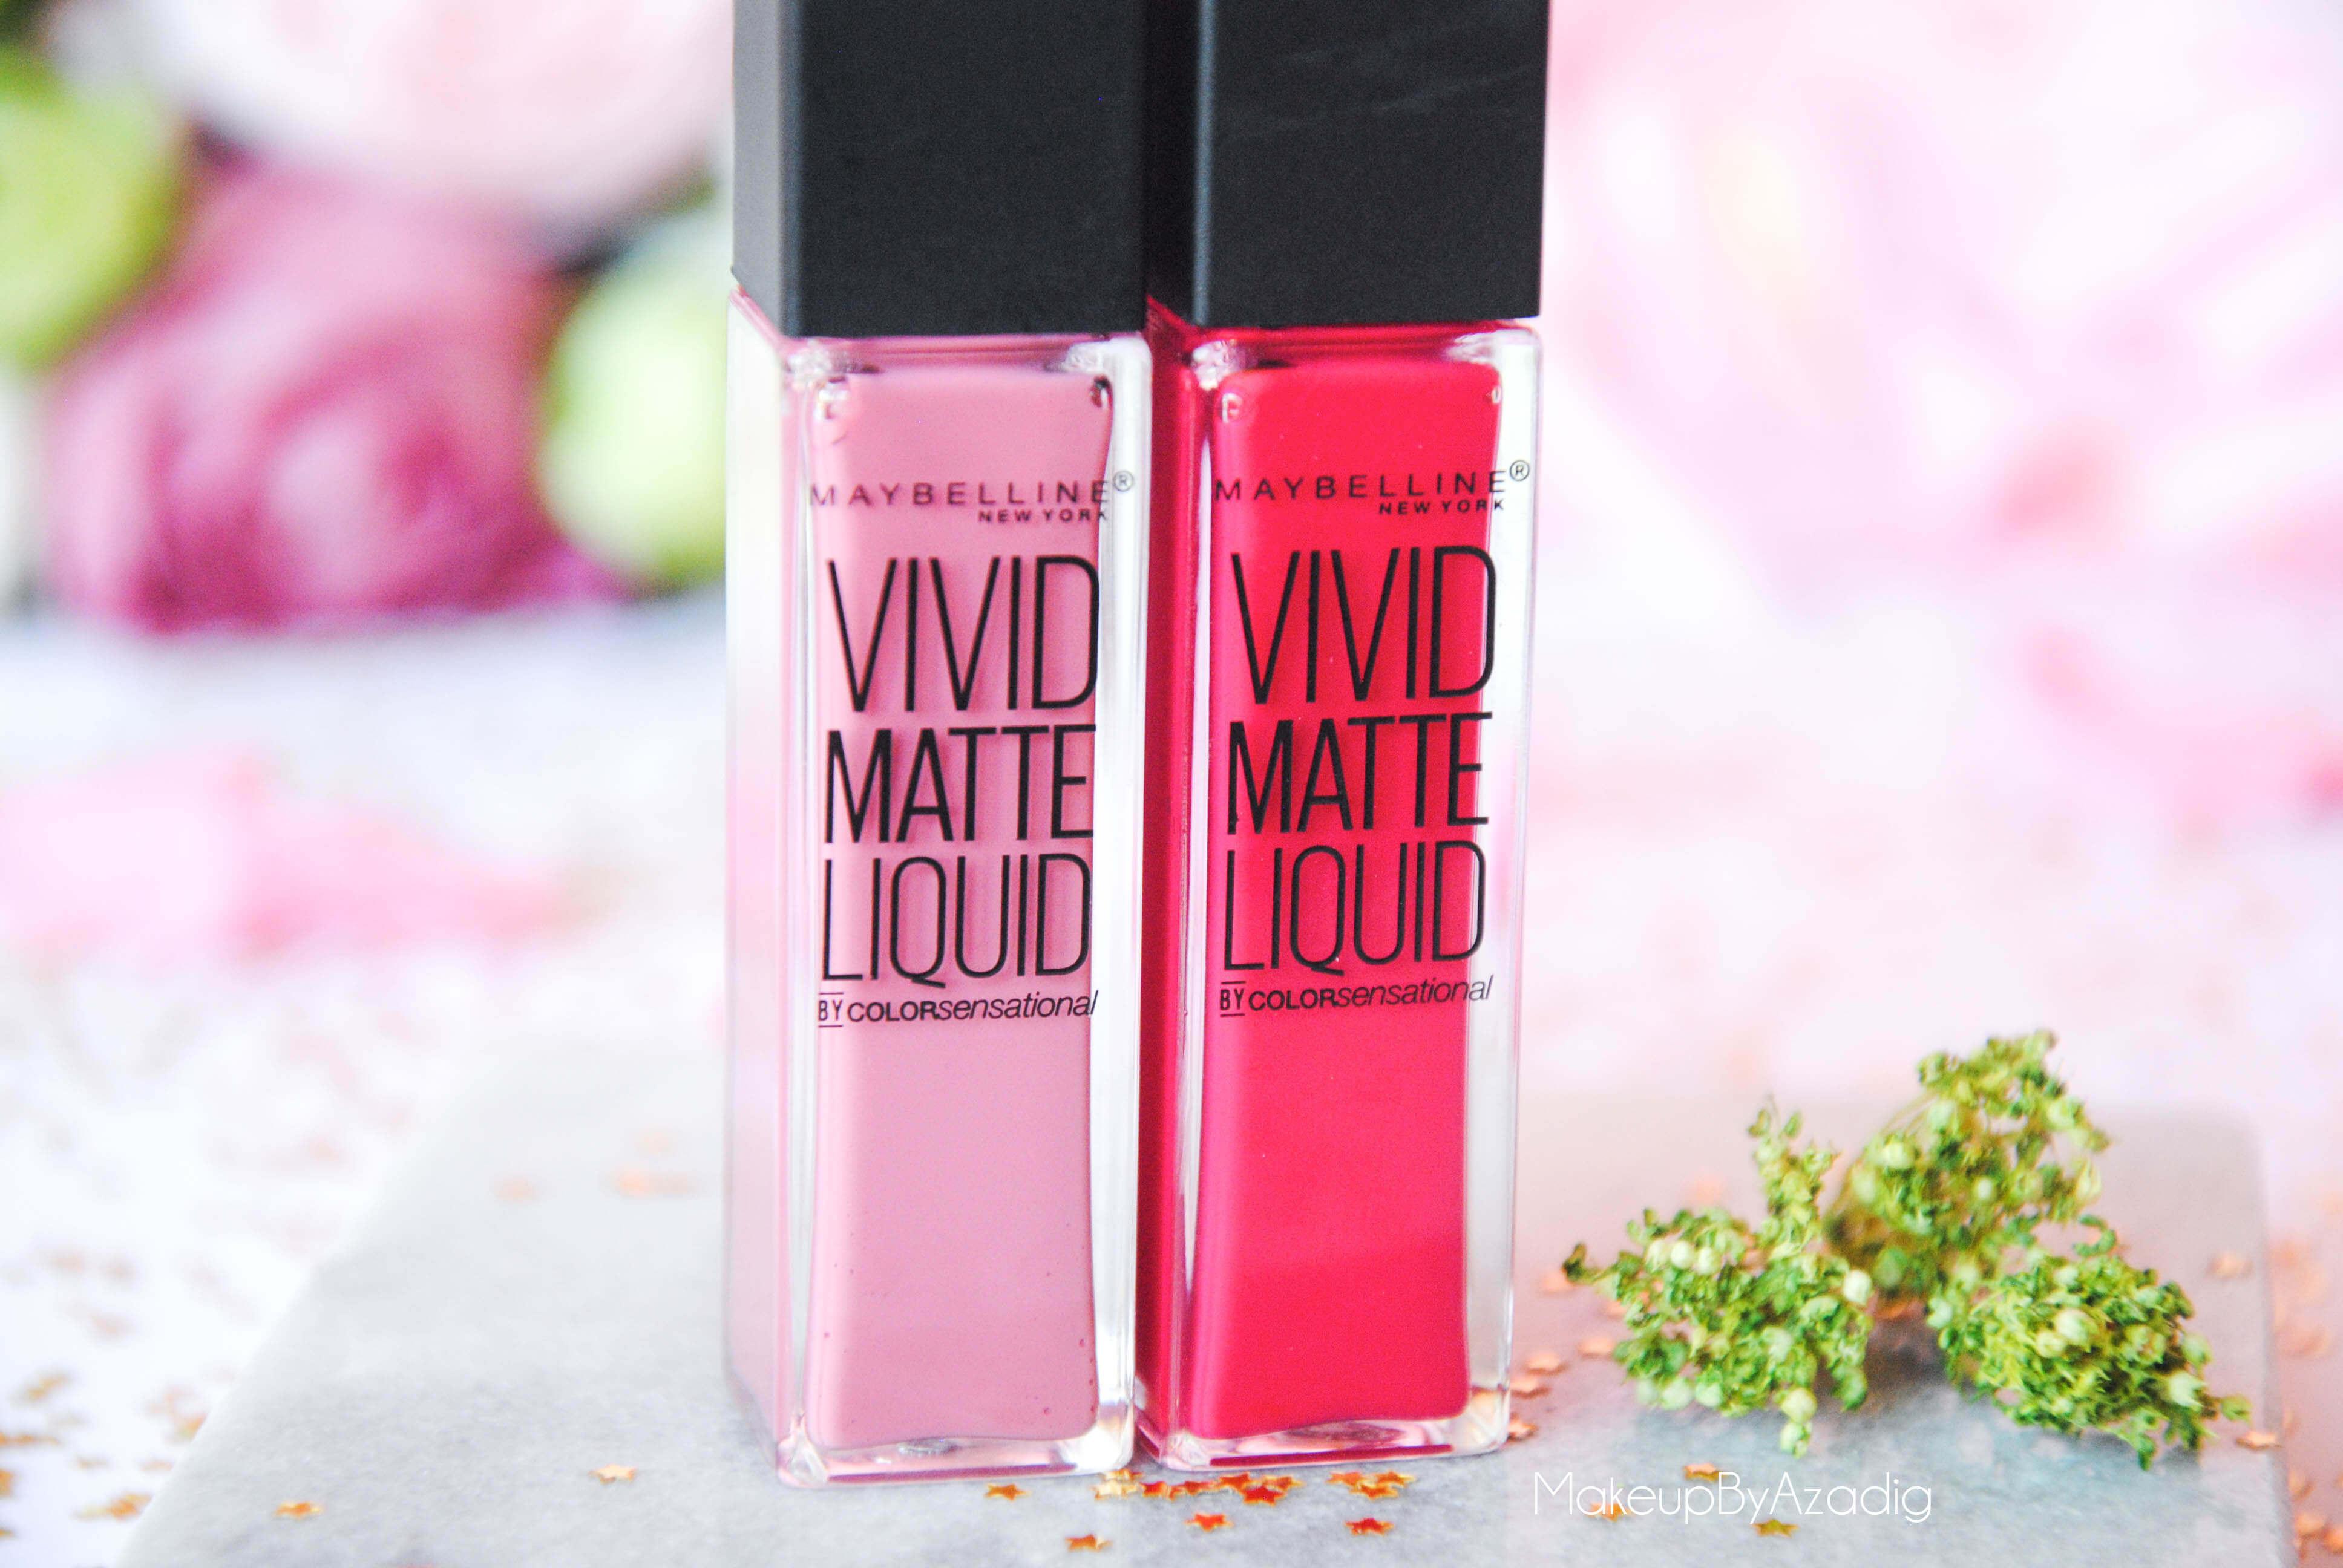 makeupbyazadig-troyes-gemey-maybelline-new-york-nude-flush-orange-shot-possessed-plum-berry-boost-fuchsia-ecstasy-corail-courage-vivid-matte-liquid-by-colorsensational-ny